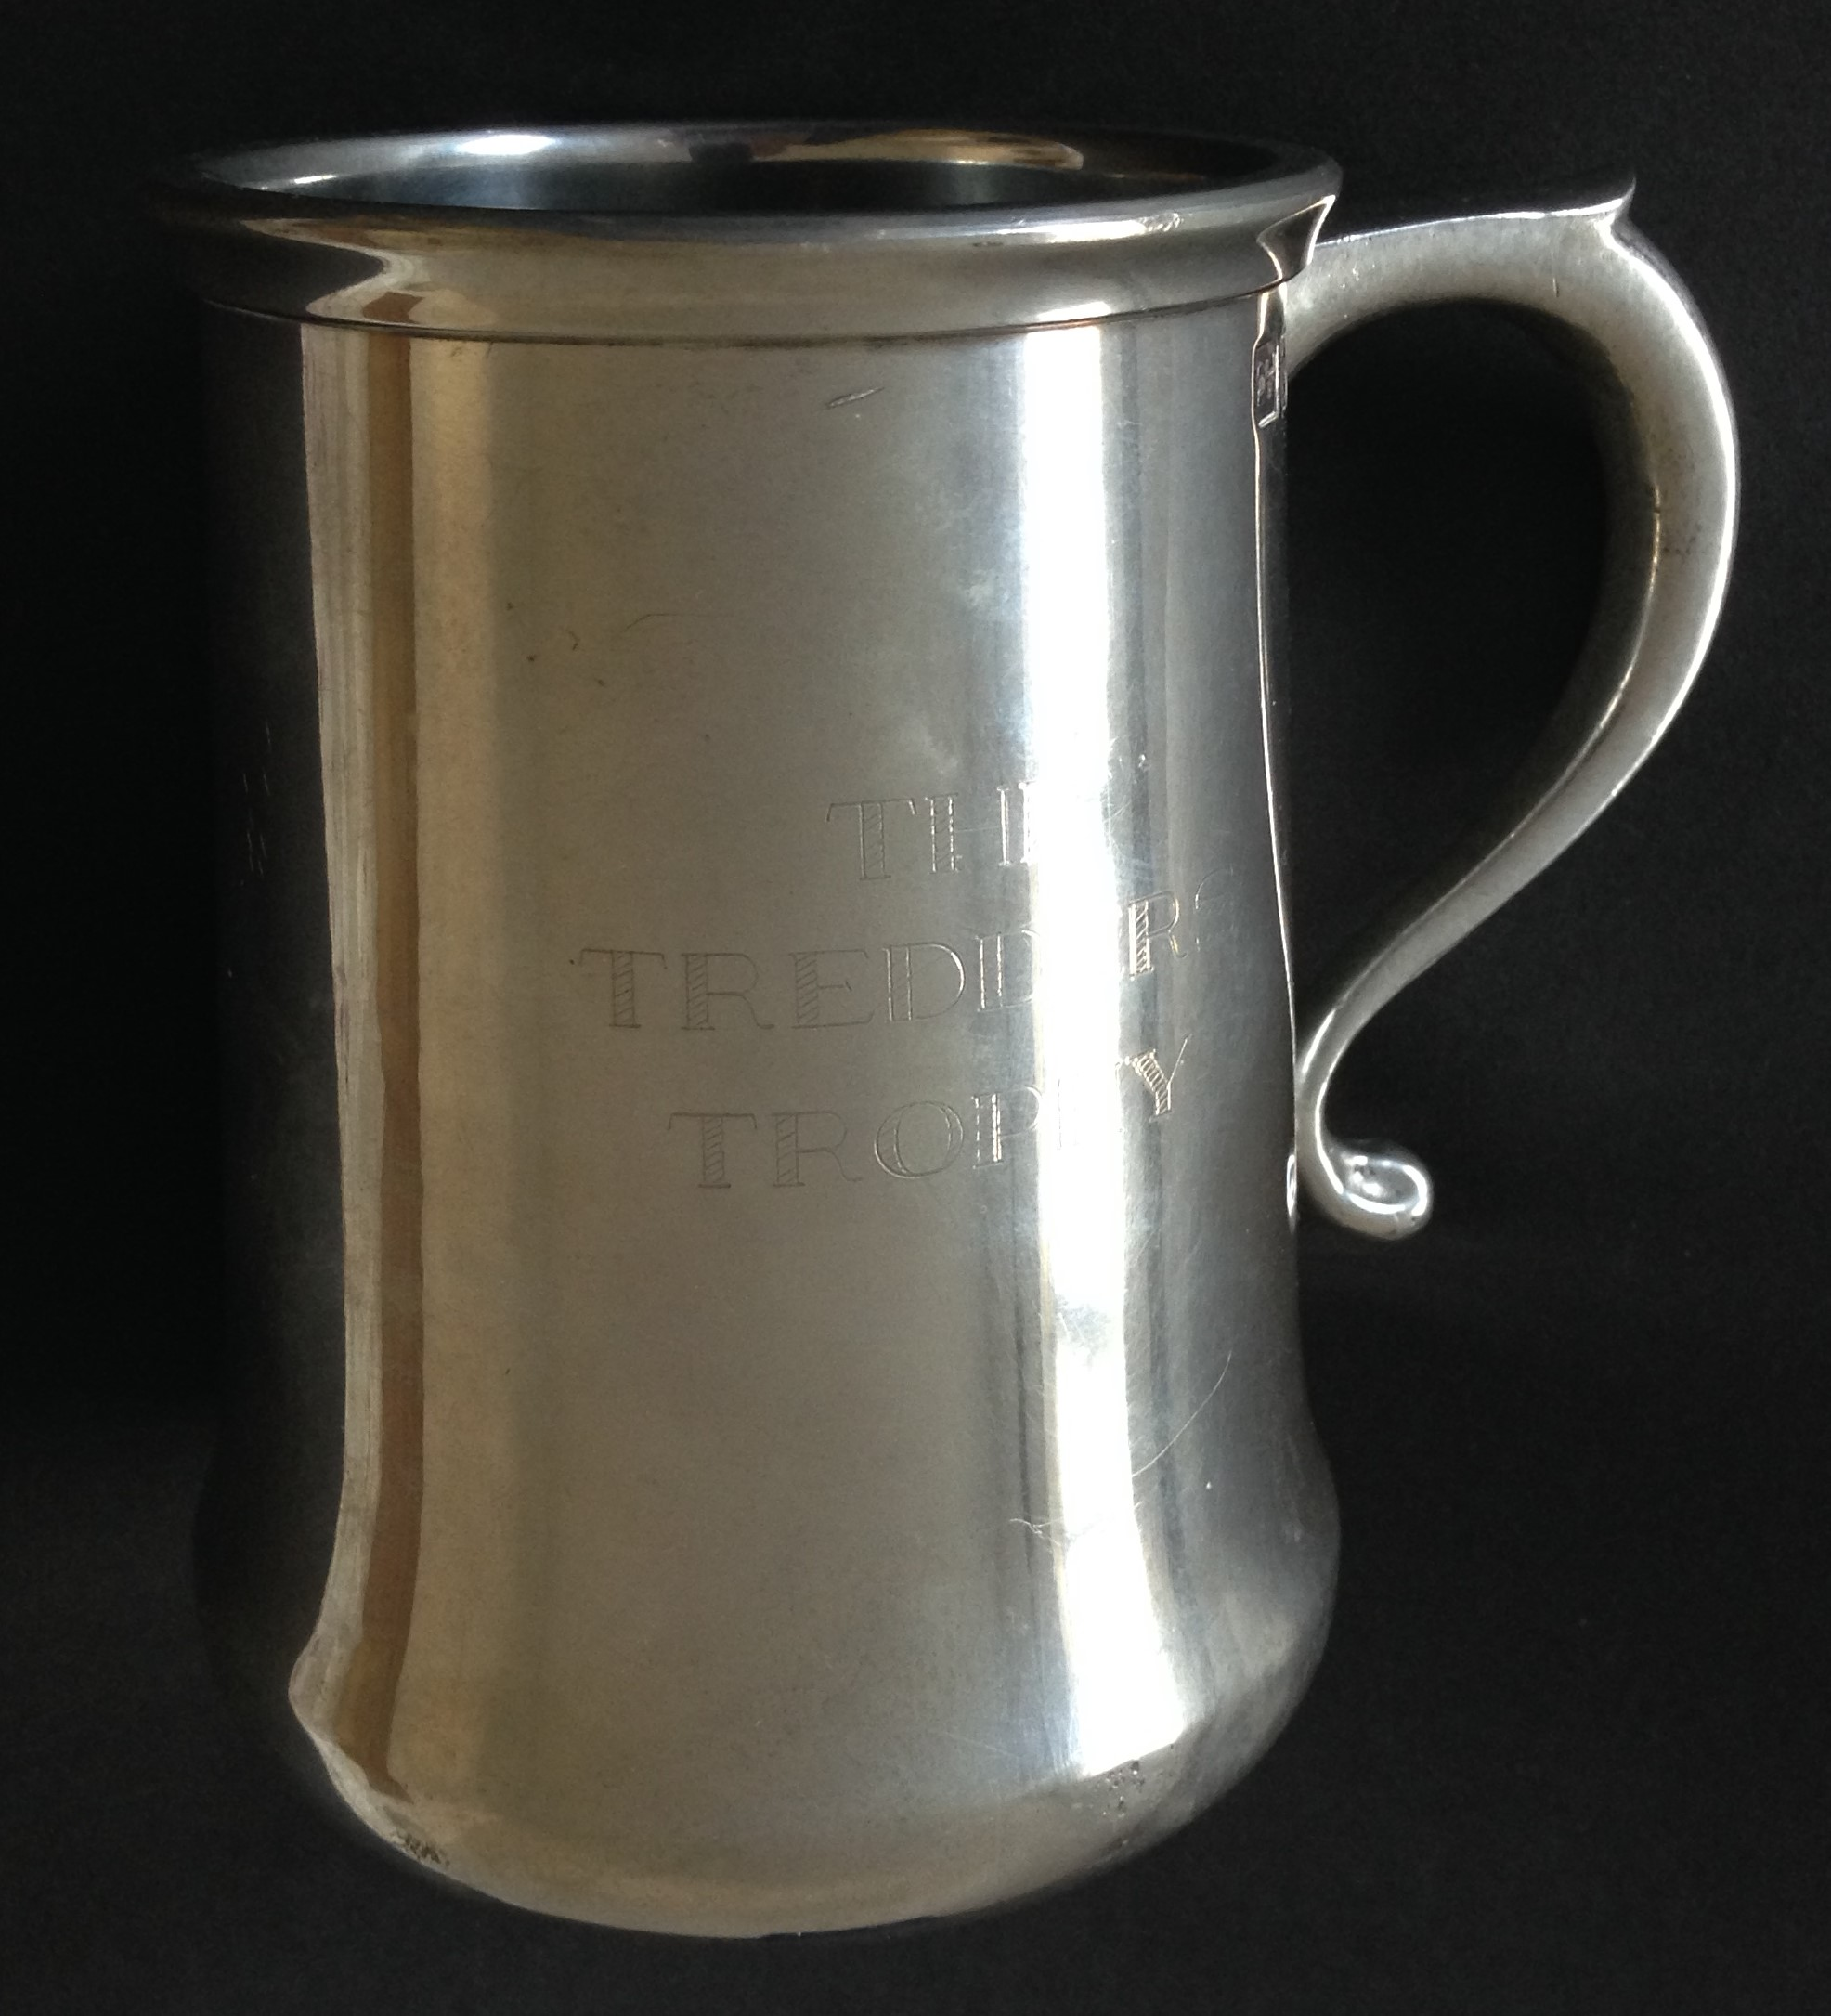 Tredders Trophy